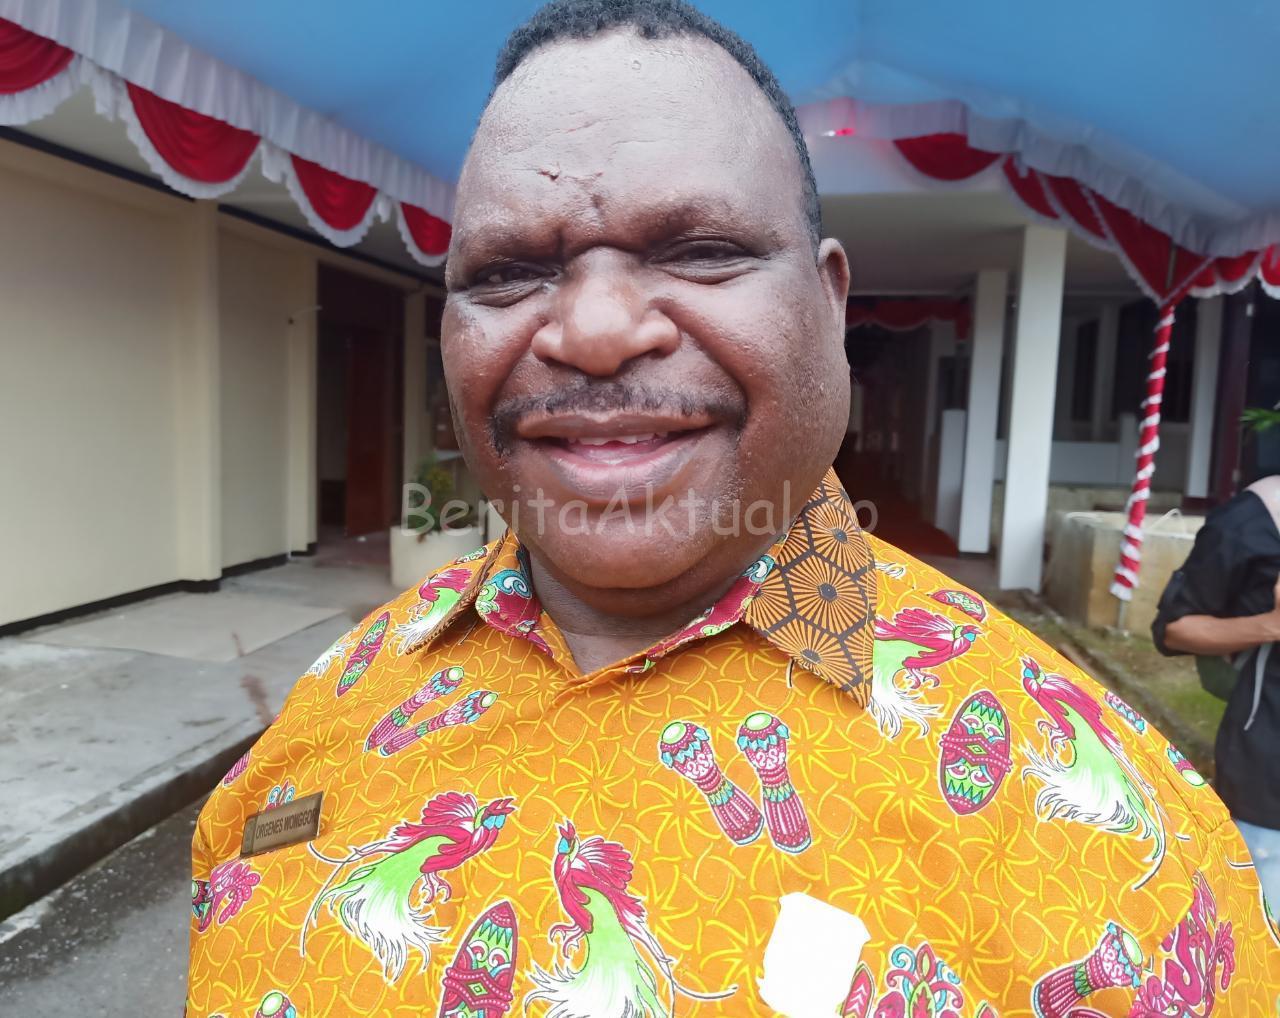 Ketua DPR Papua Barat Relokasi Anggaran Dewan Rp10,5 Miliar Cegah Covid-19 3 IMG 20200414 WA0078